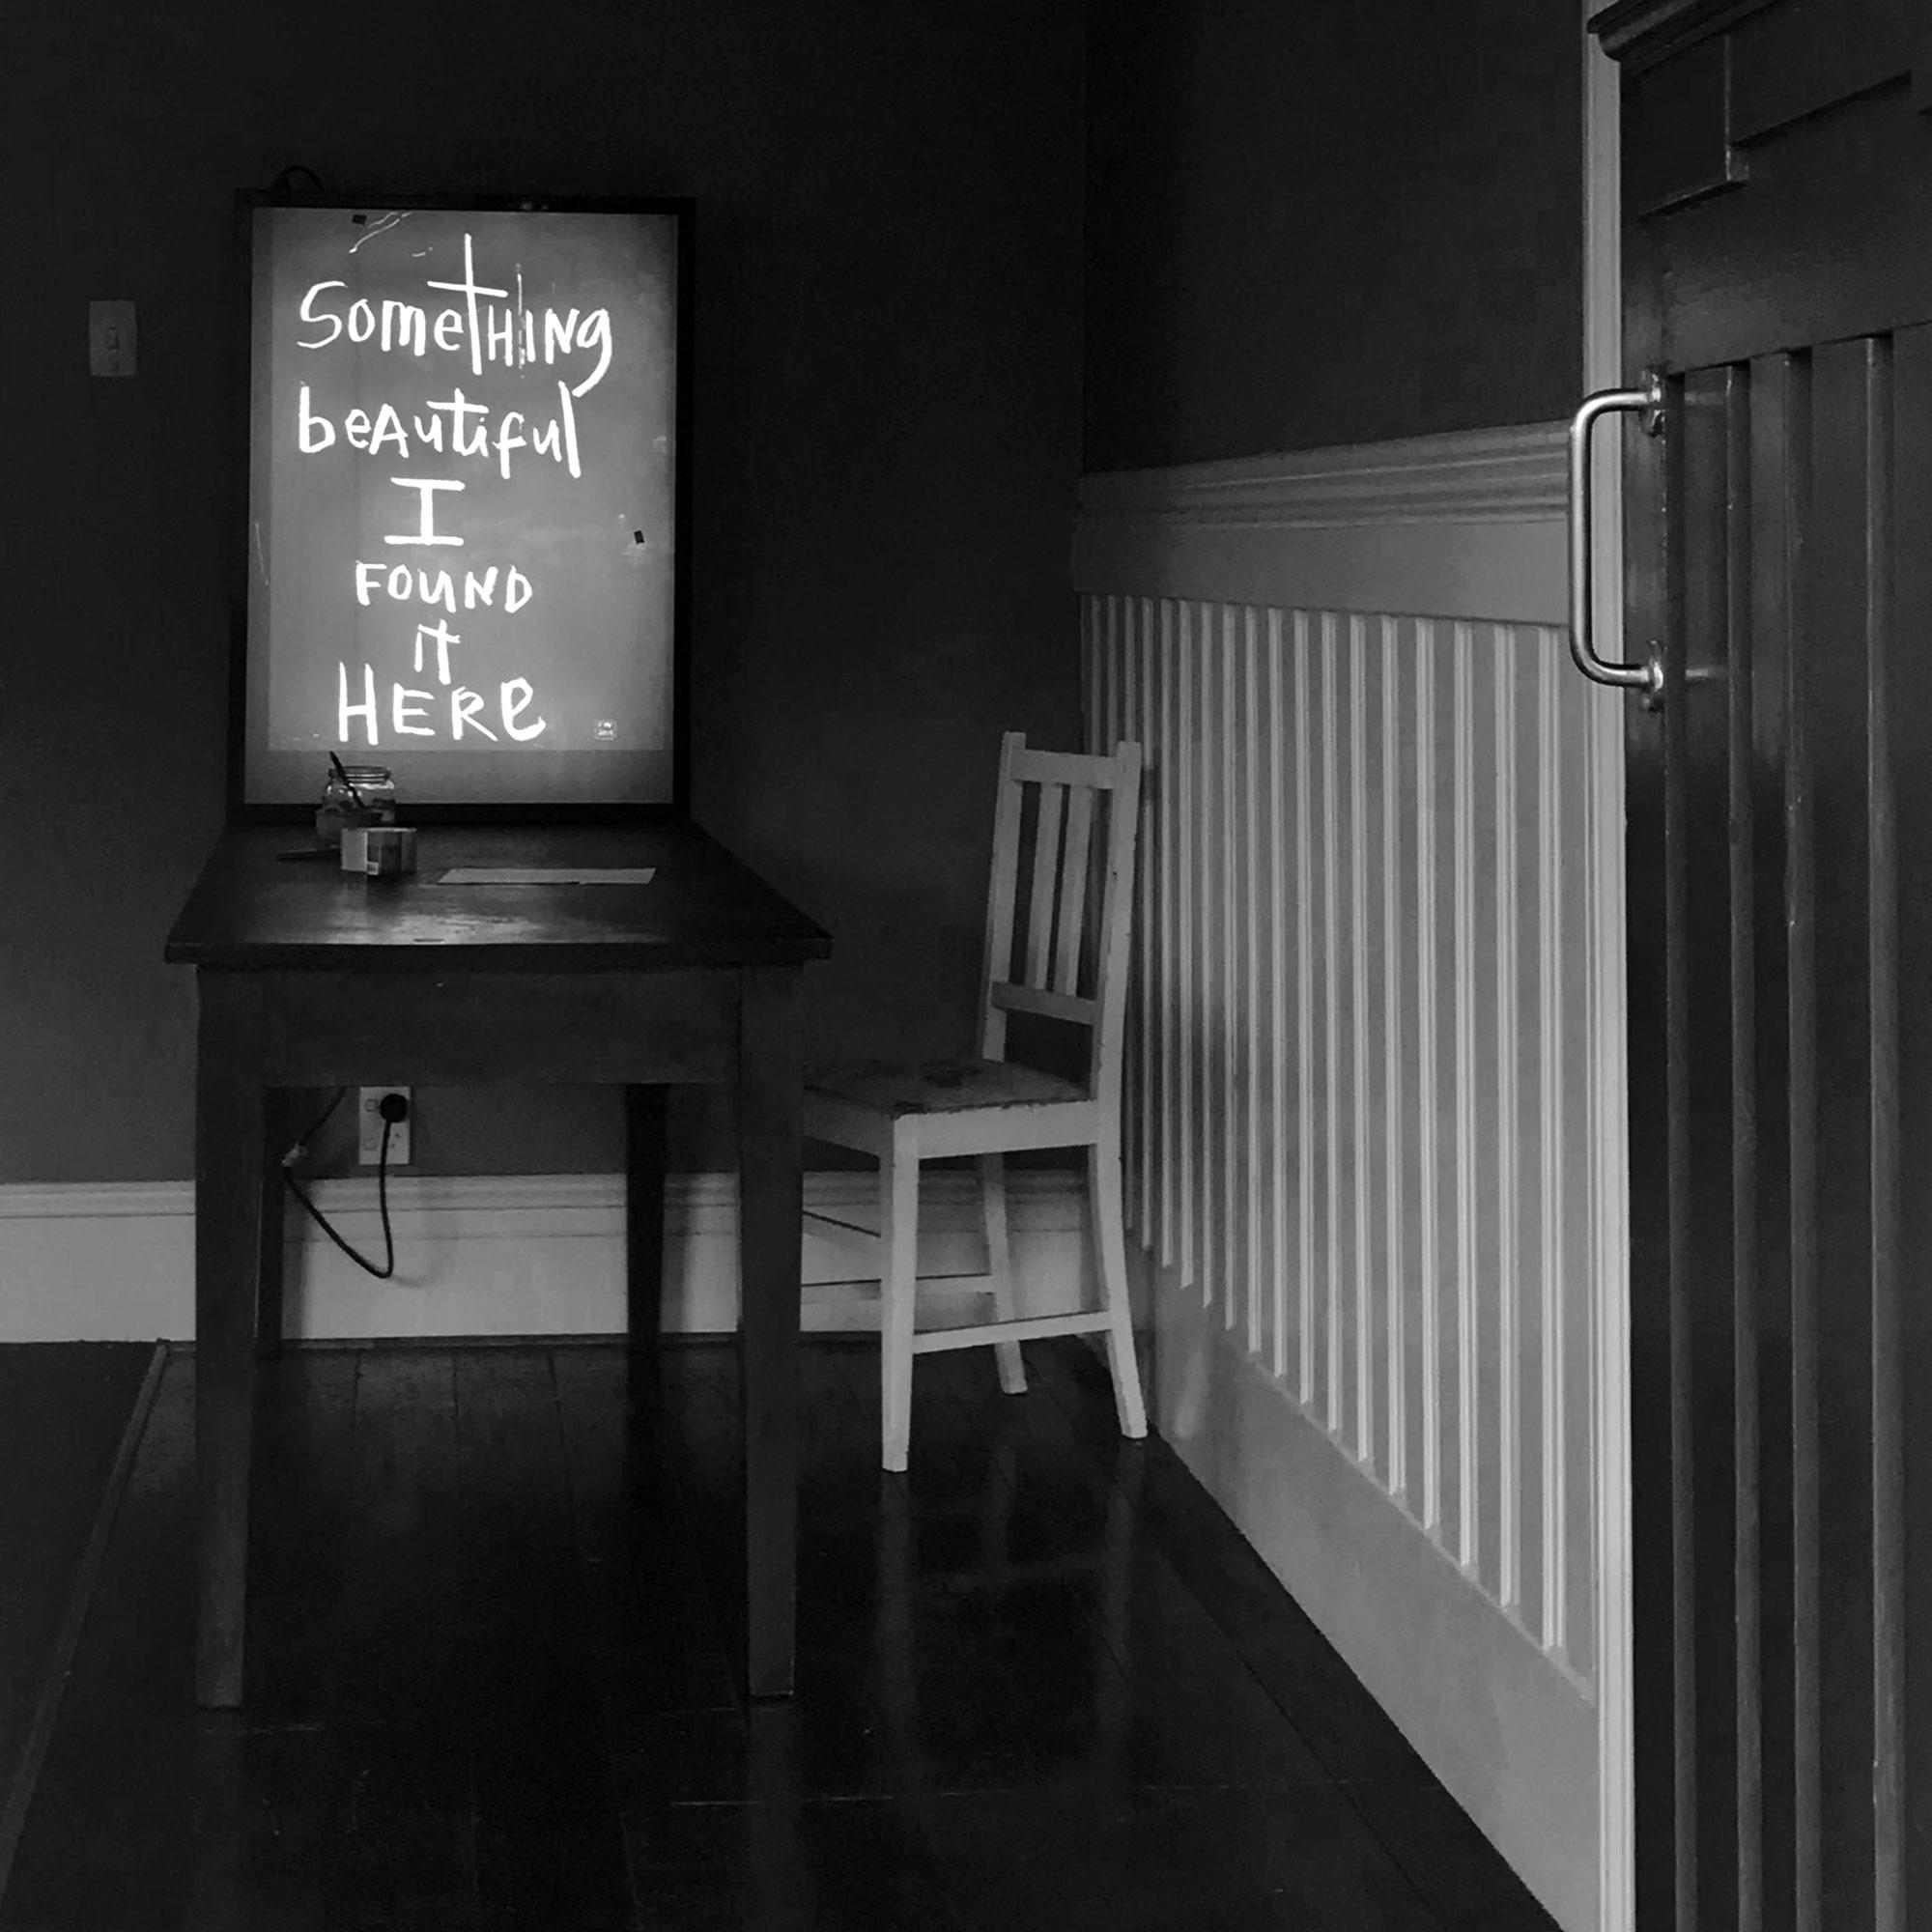 Something beautiful I found it here, [blackboard], 2015  // lightbox.